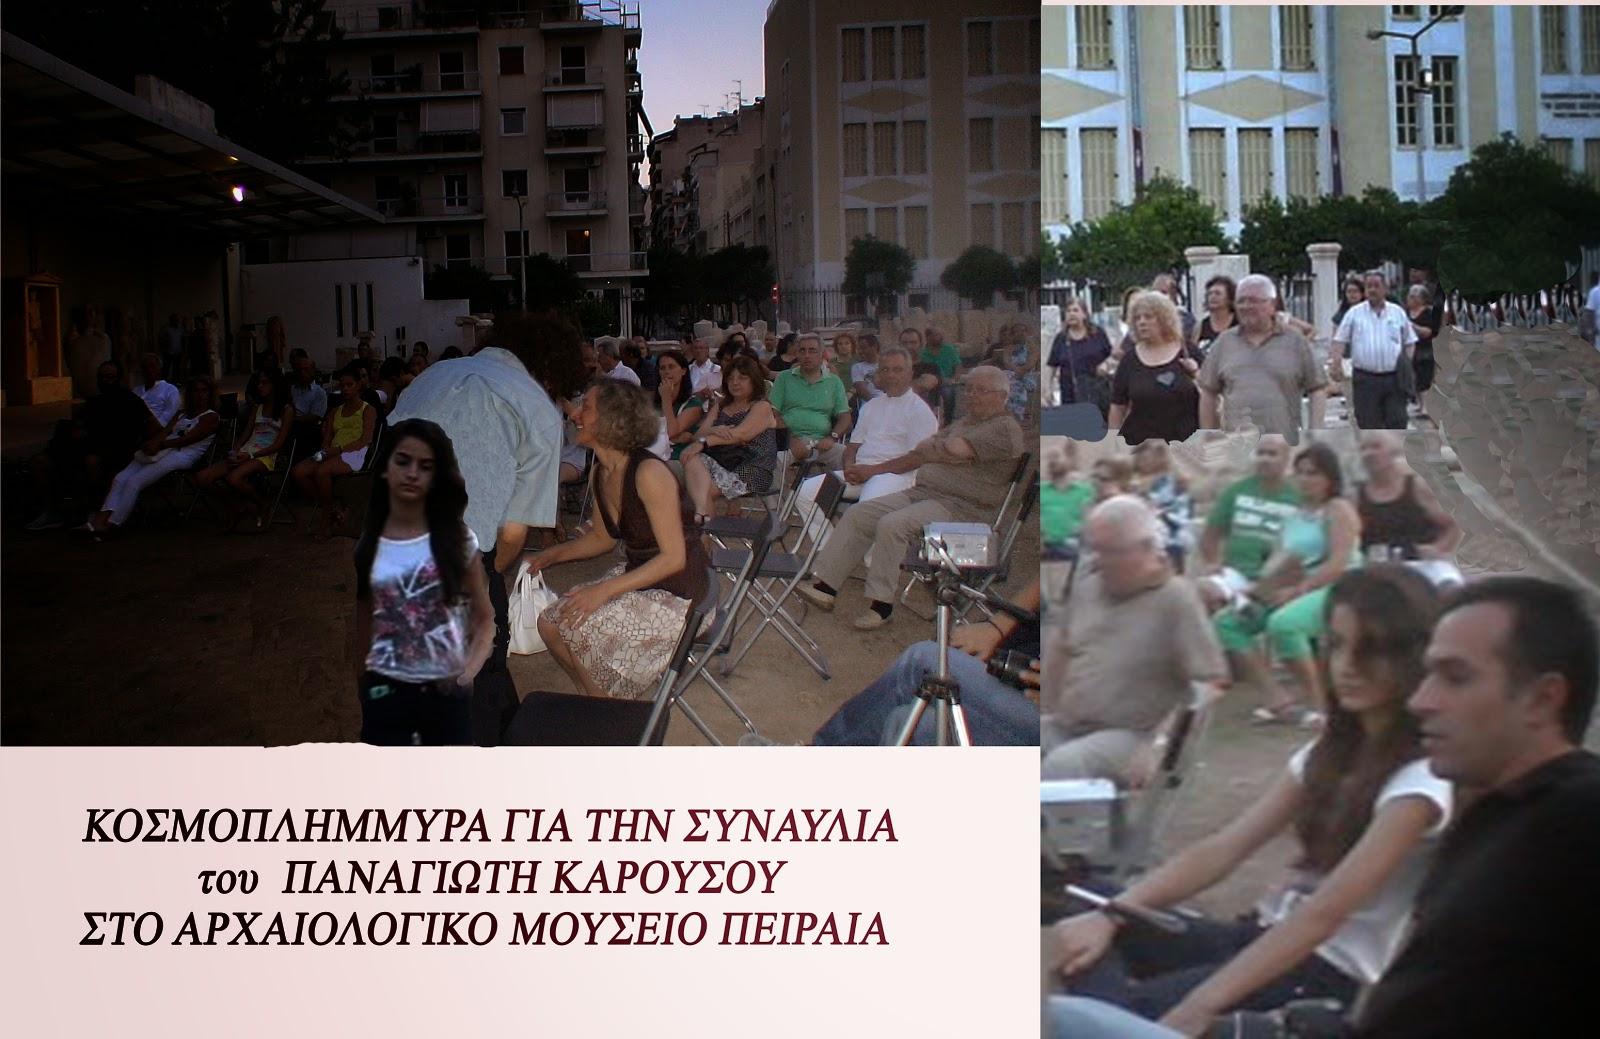 http://sofigraf2009.blogspot.gr/2014/08/1082014-2100.html